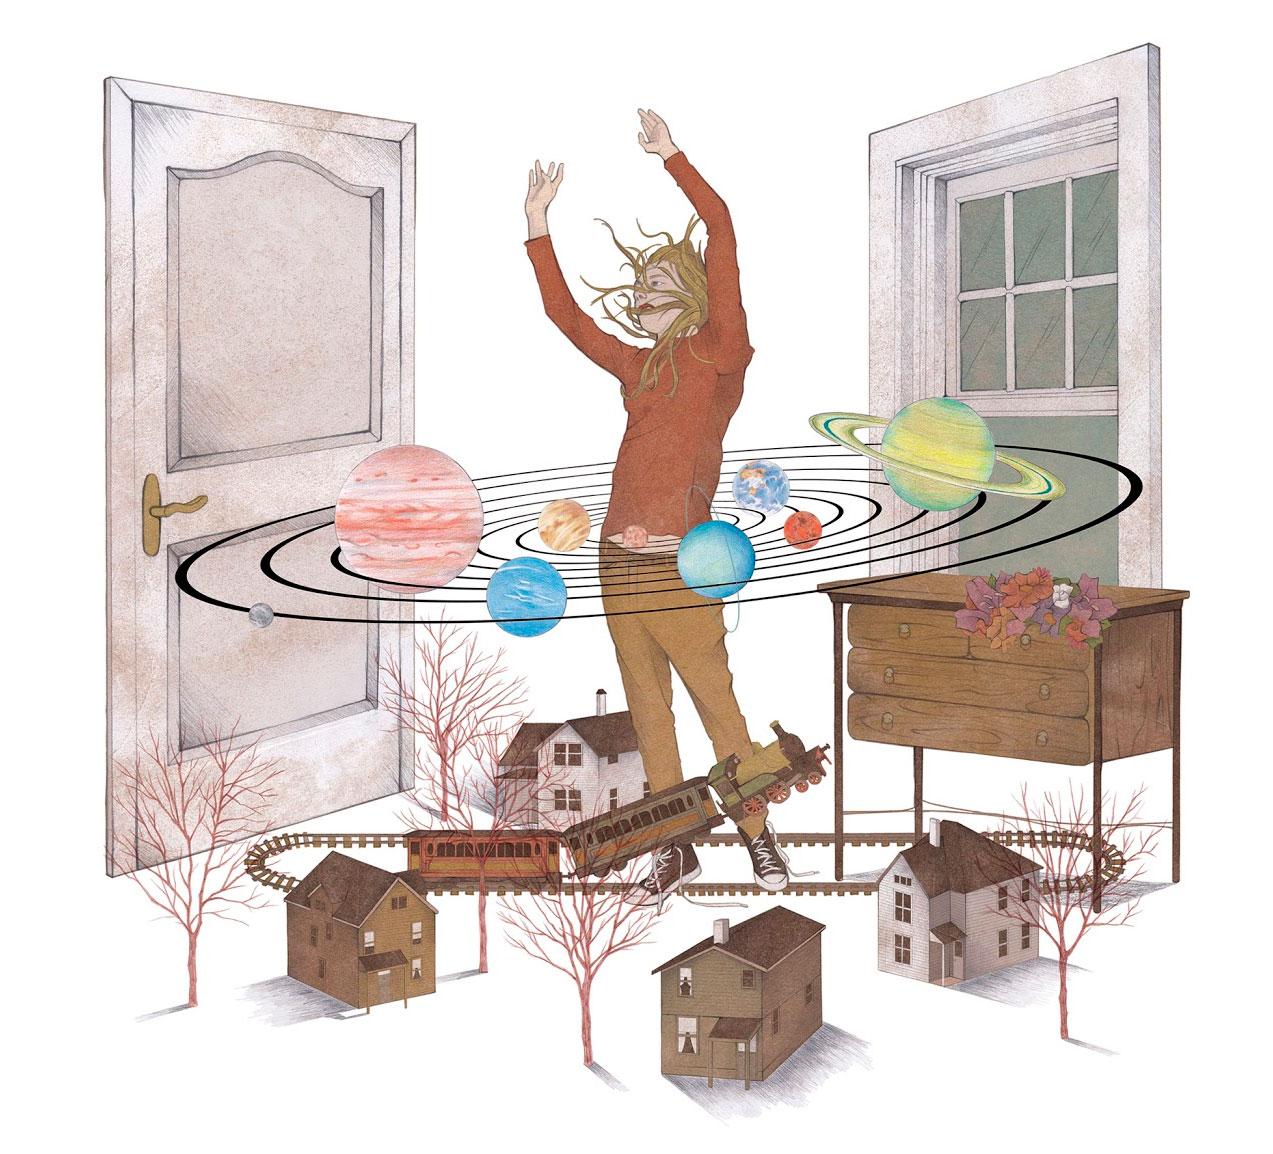 nader-sharaf-ilustracion-04